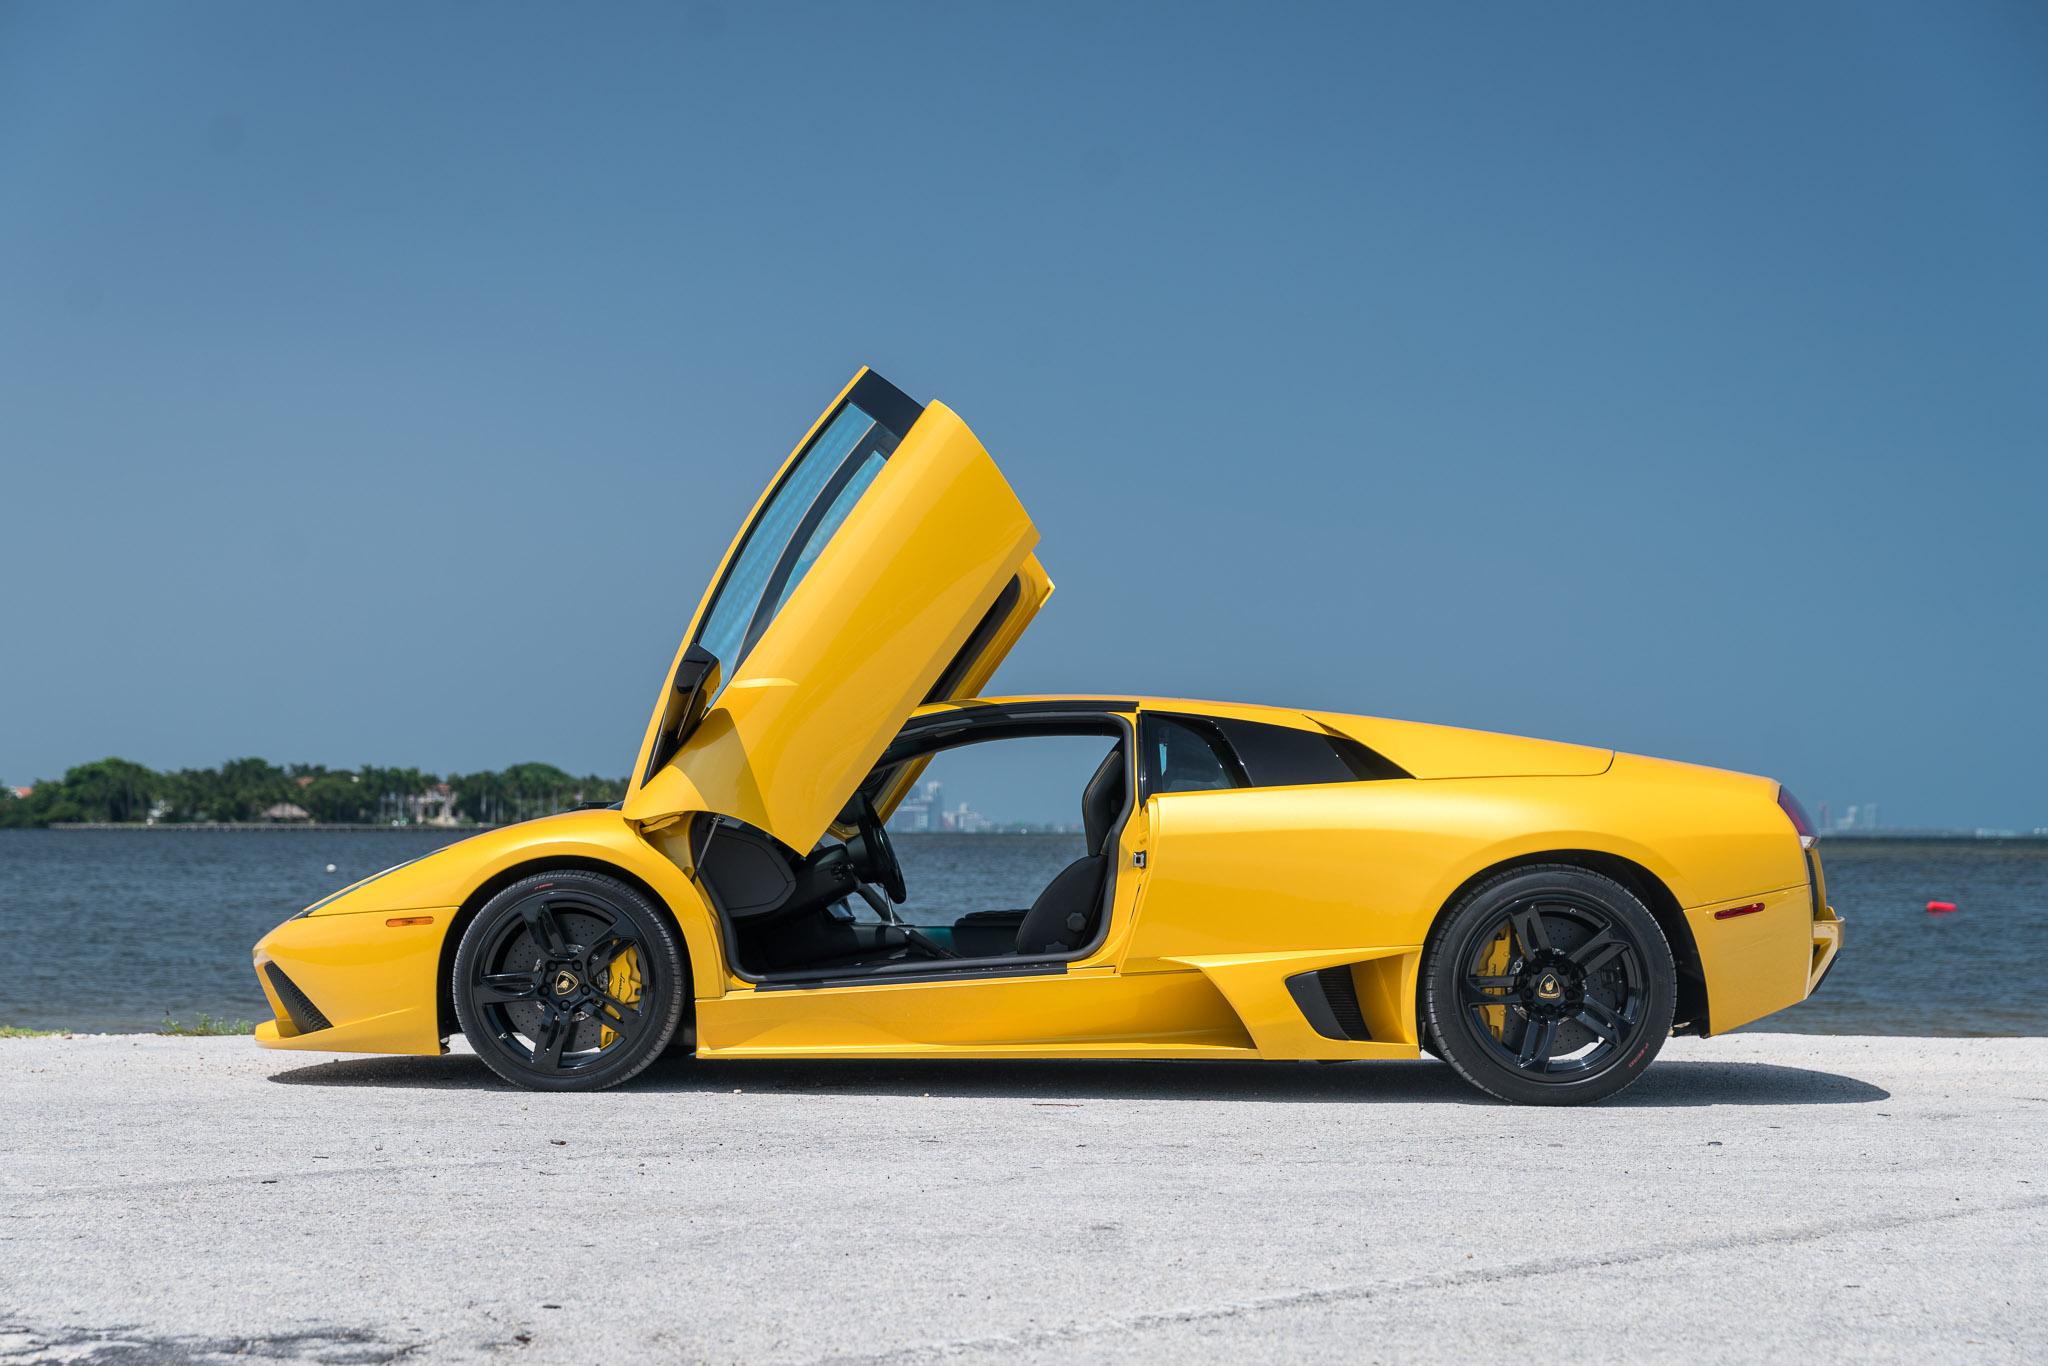 2008 Lamborghini Murcielago Lp640 Coupe For Sale Curated Vintage Supercars